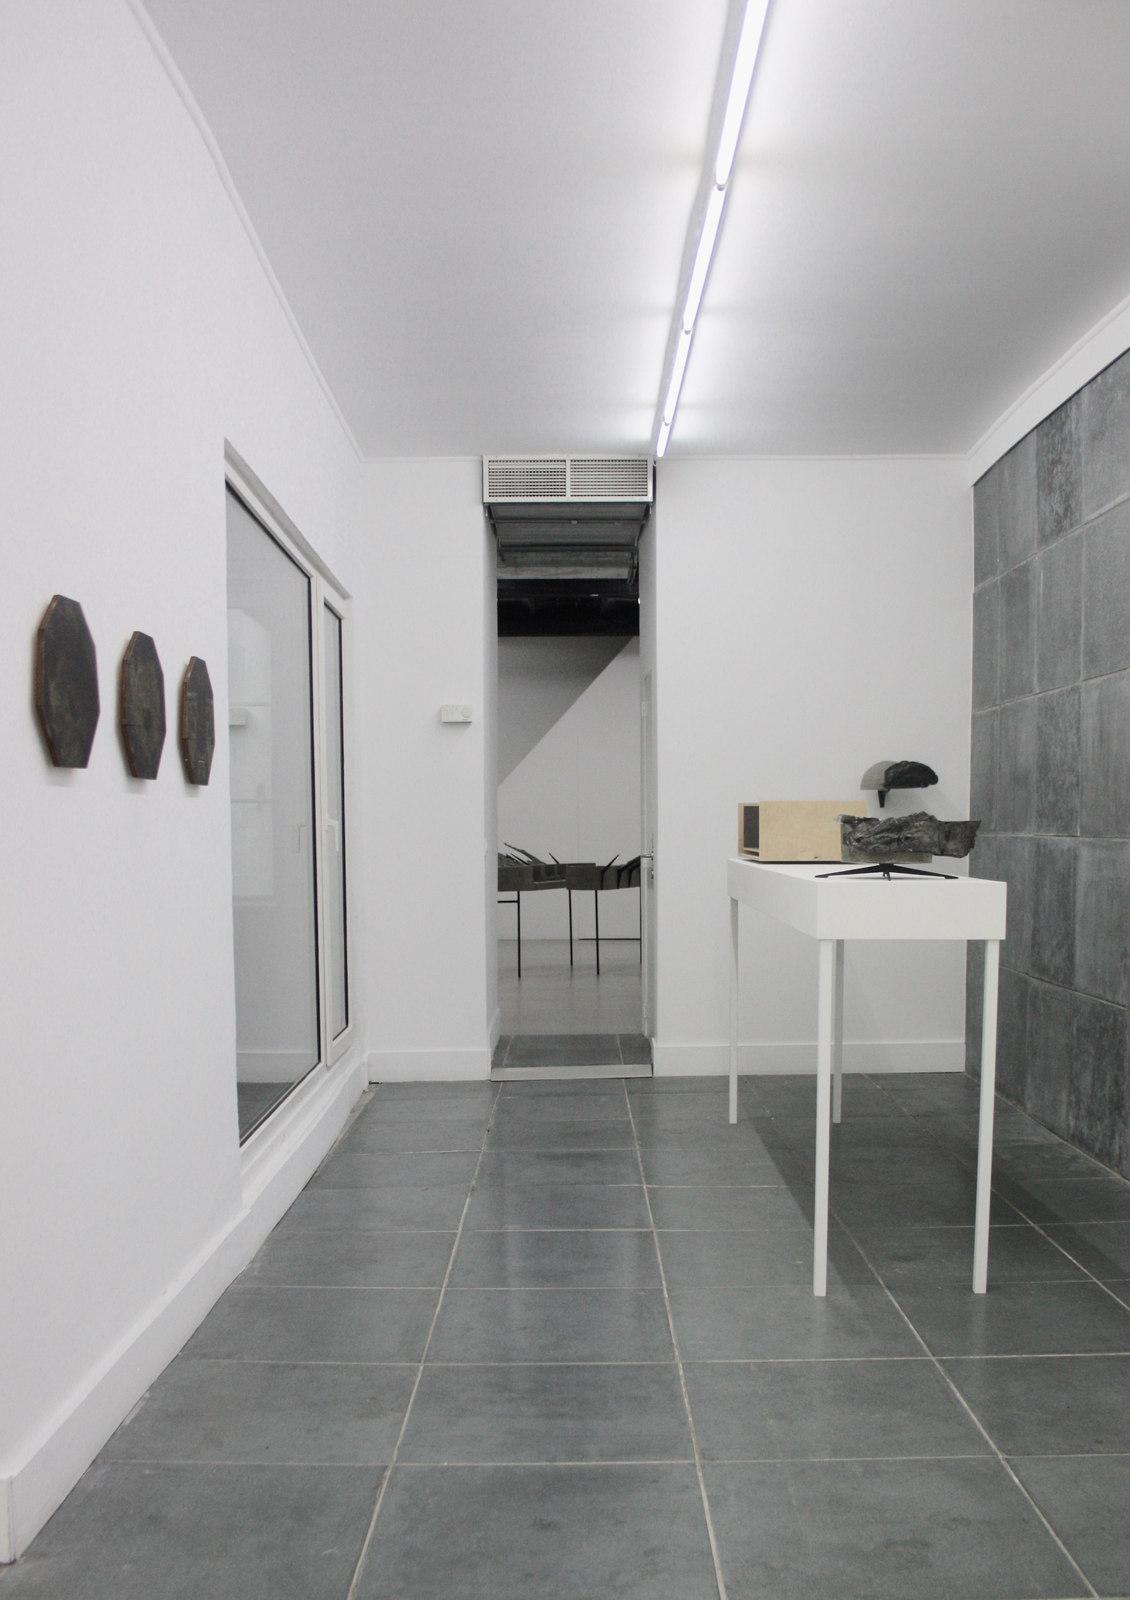 Katleen Vinck, Fractal, installation view 2